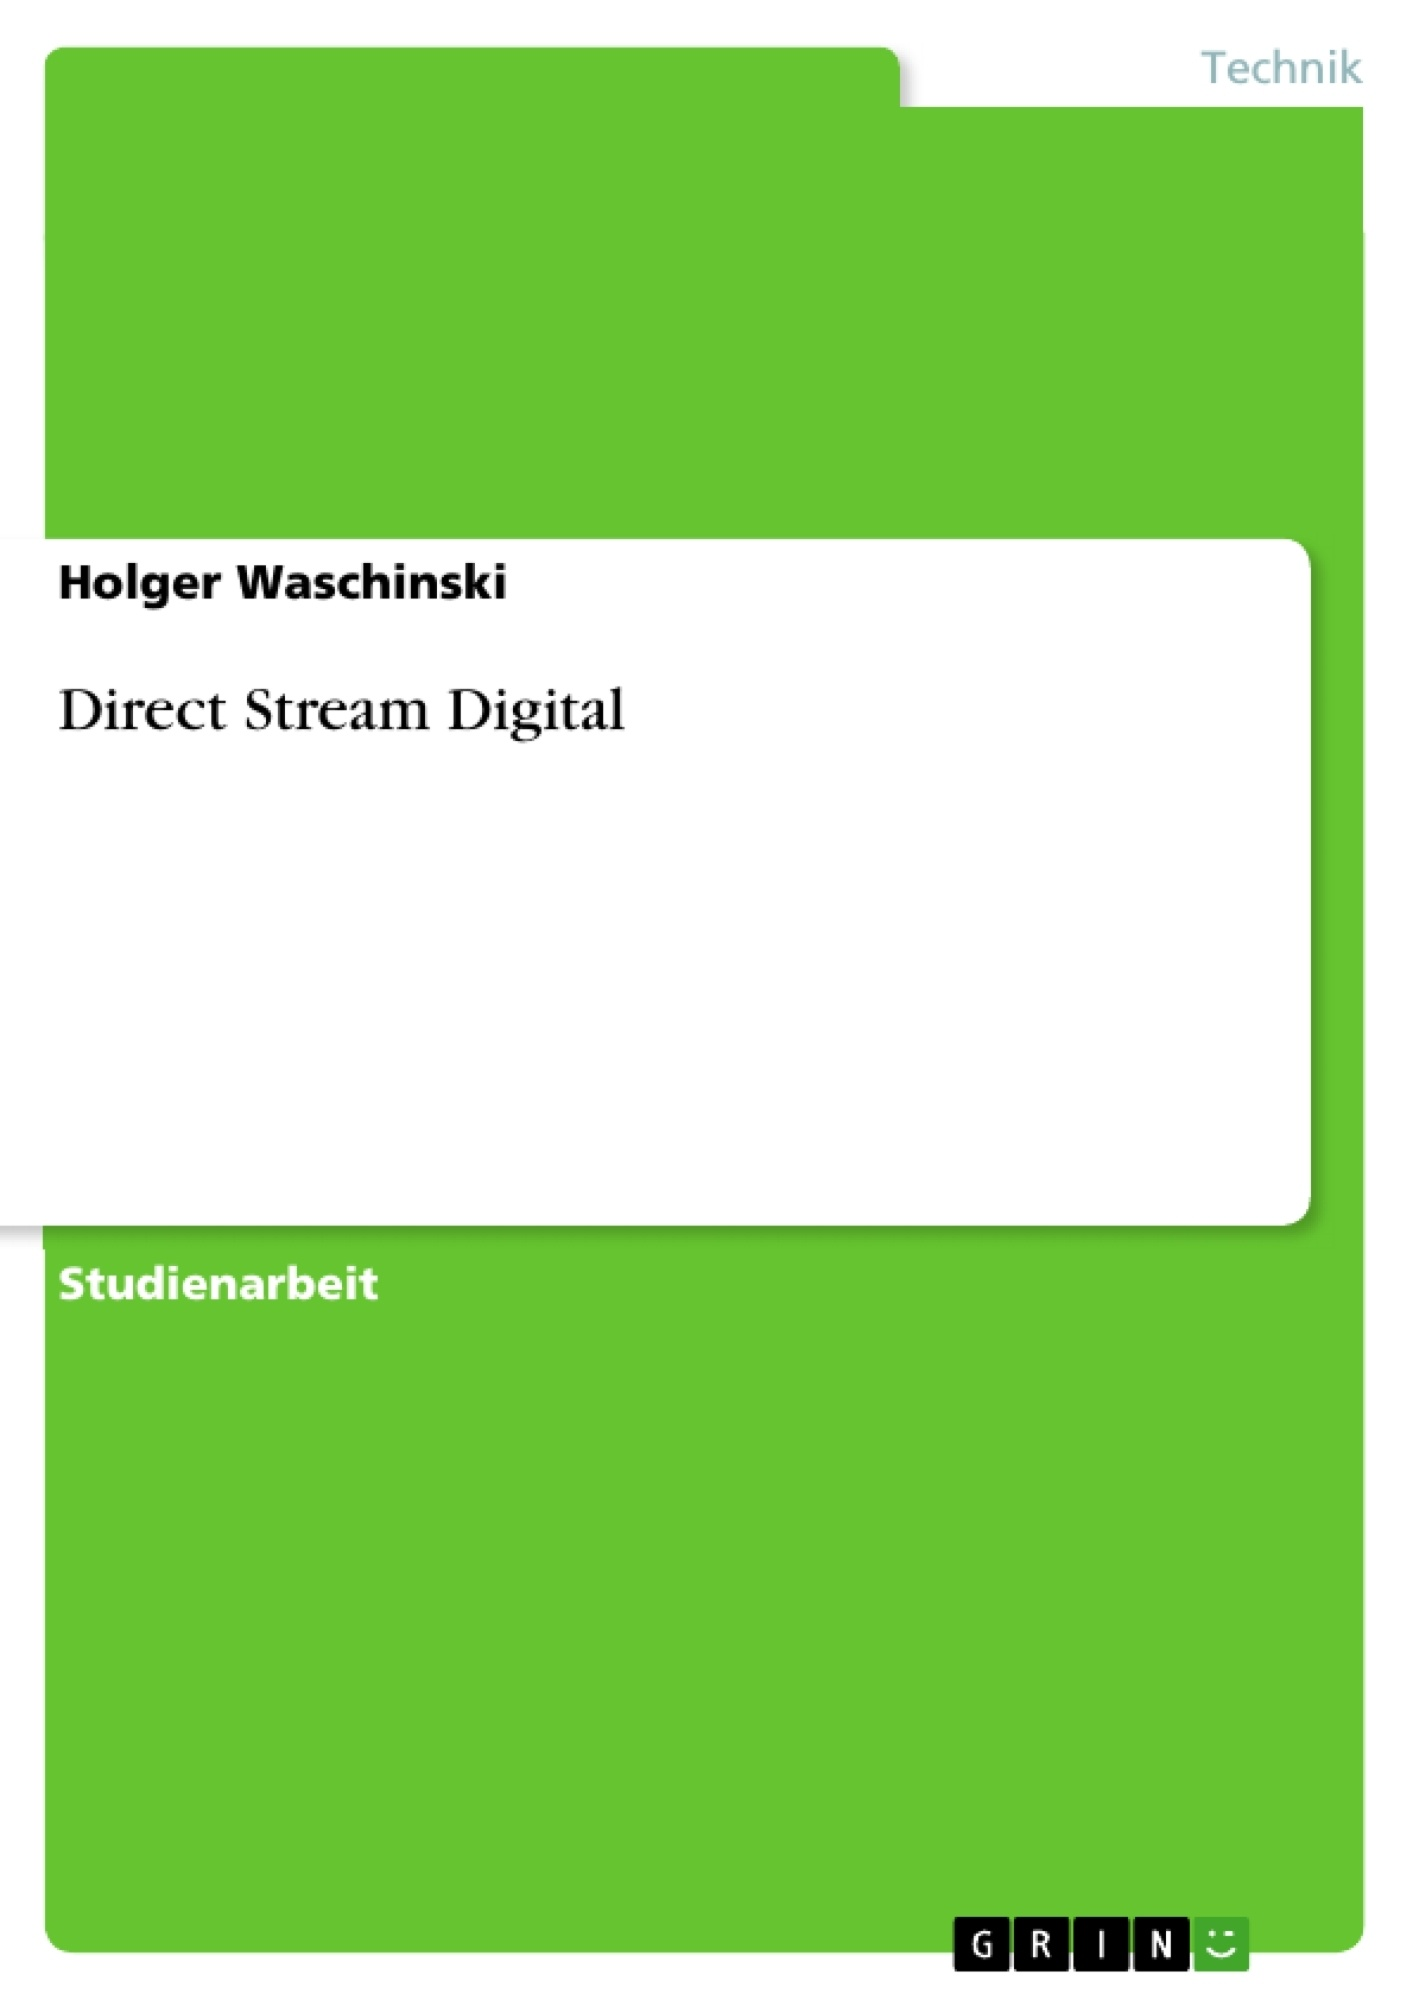 Titel: Direct Stream Digital